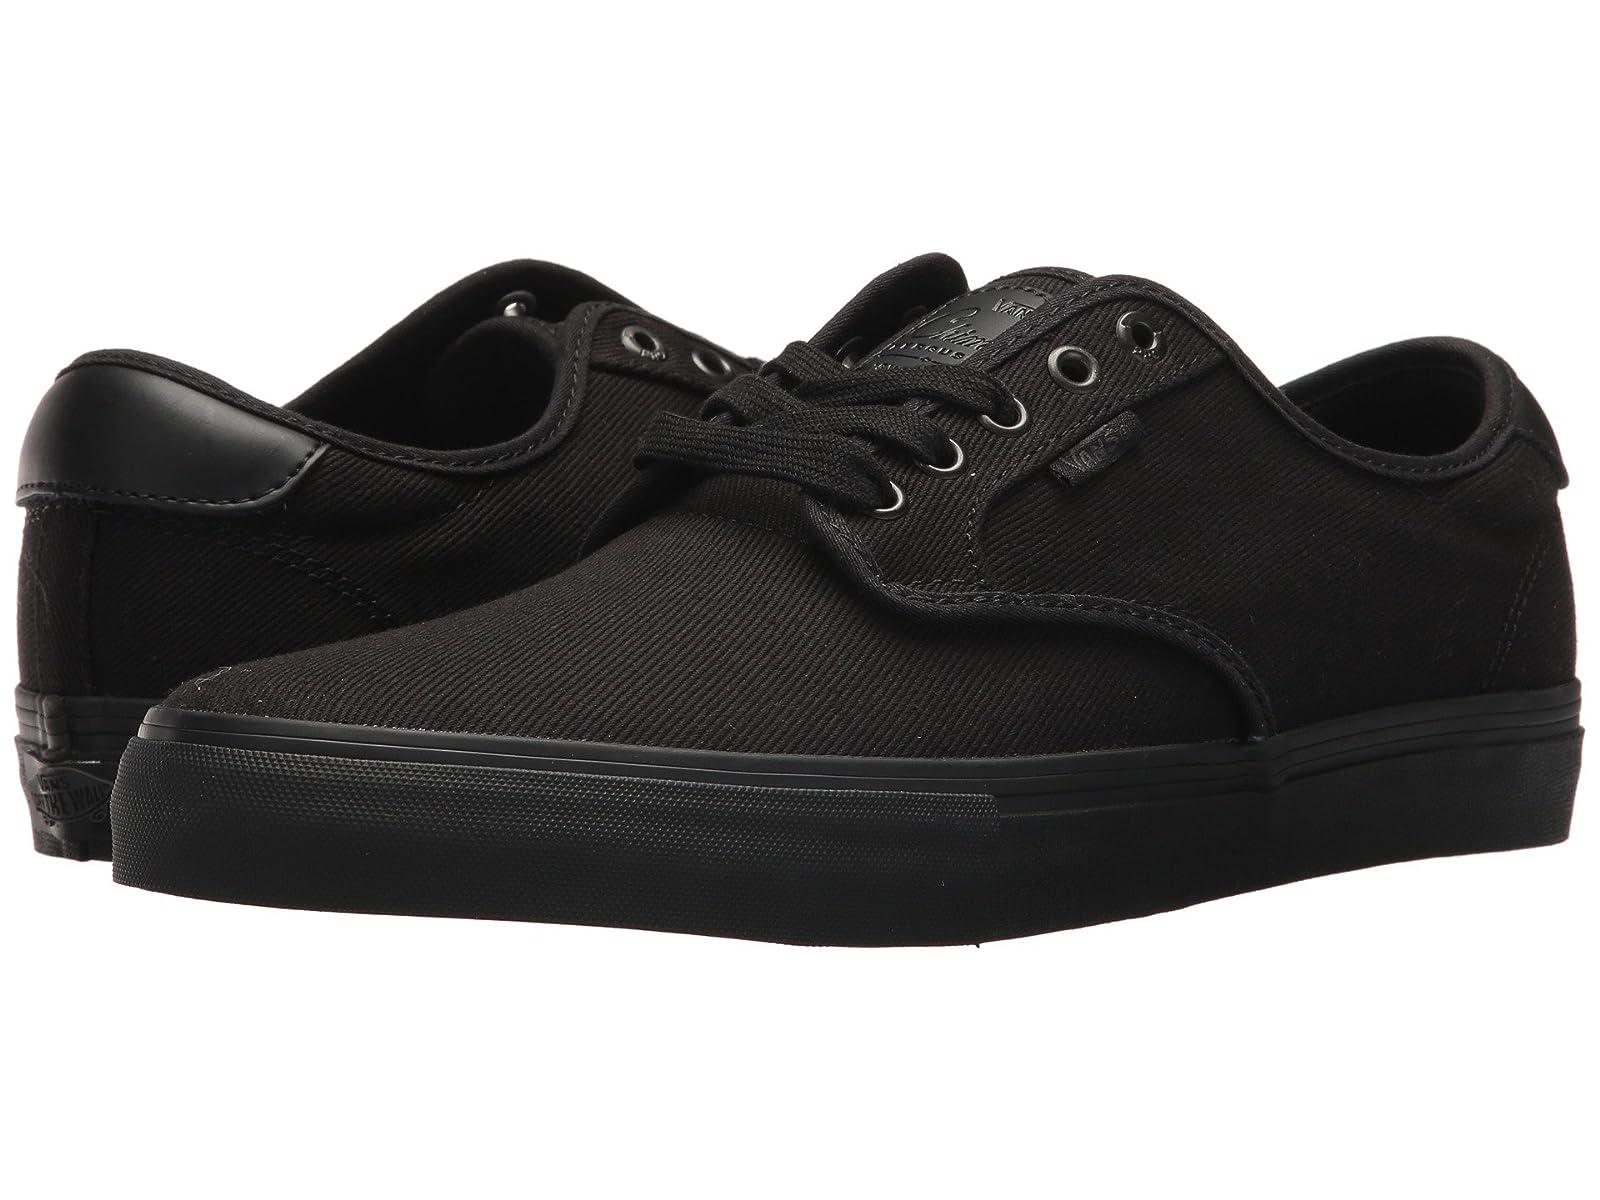 Vans Chima Ferguson ProAtmospheric grades have affordable shoes